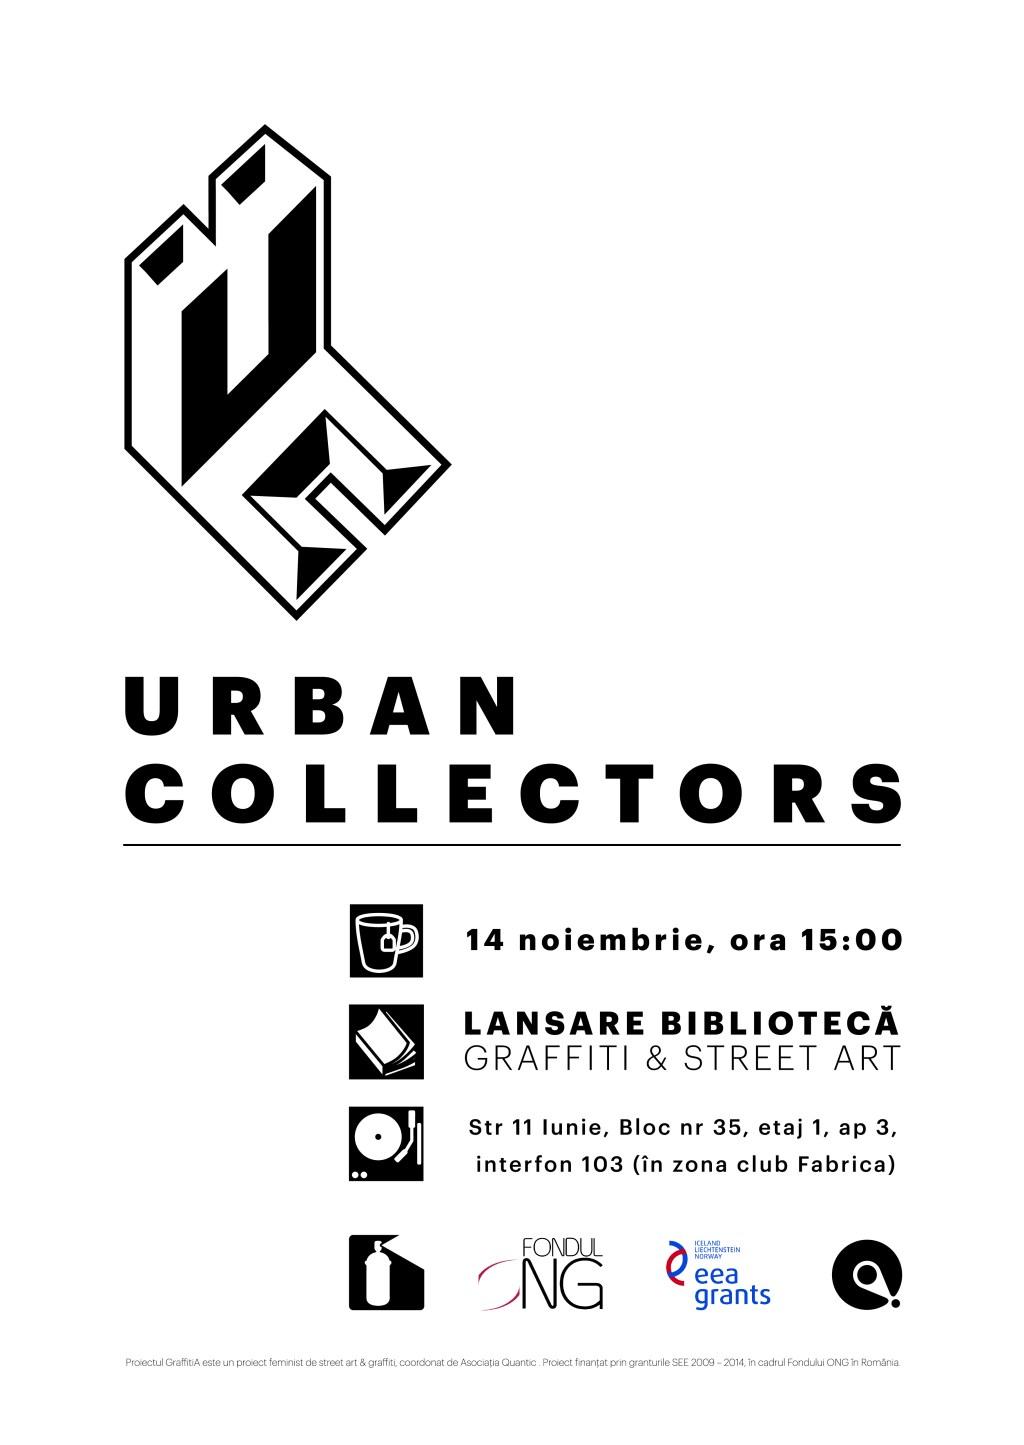 Quantic deschide Biblioteca de graffiti & street art